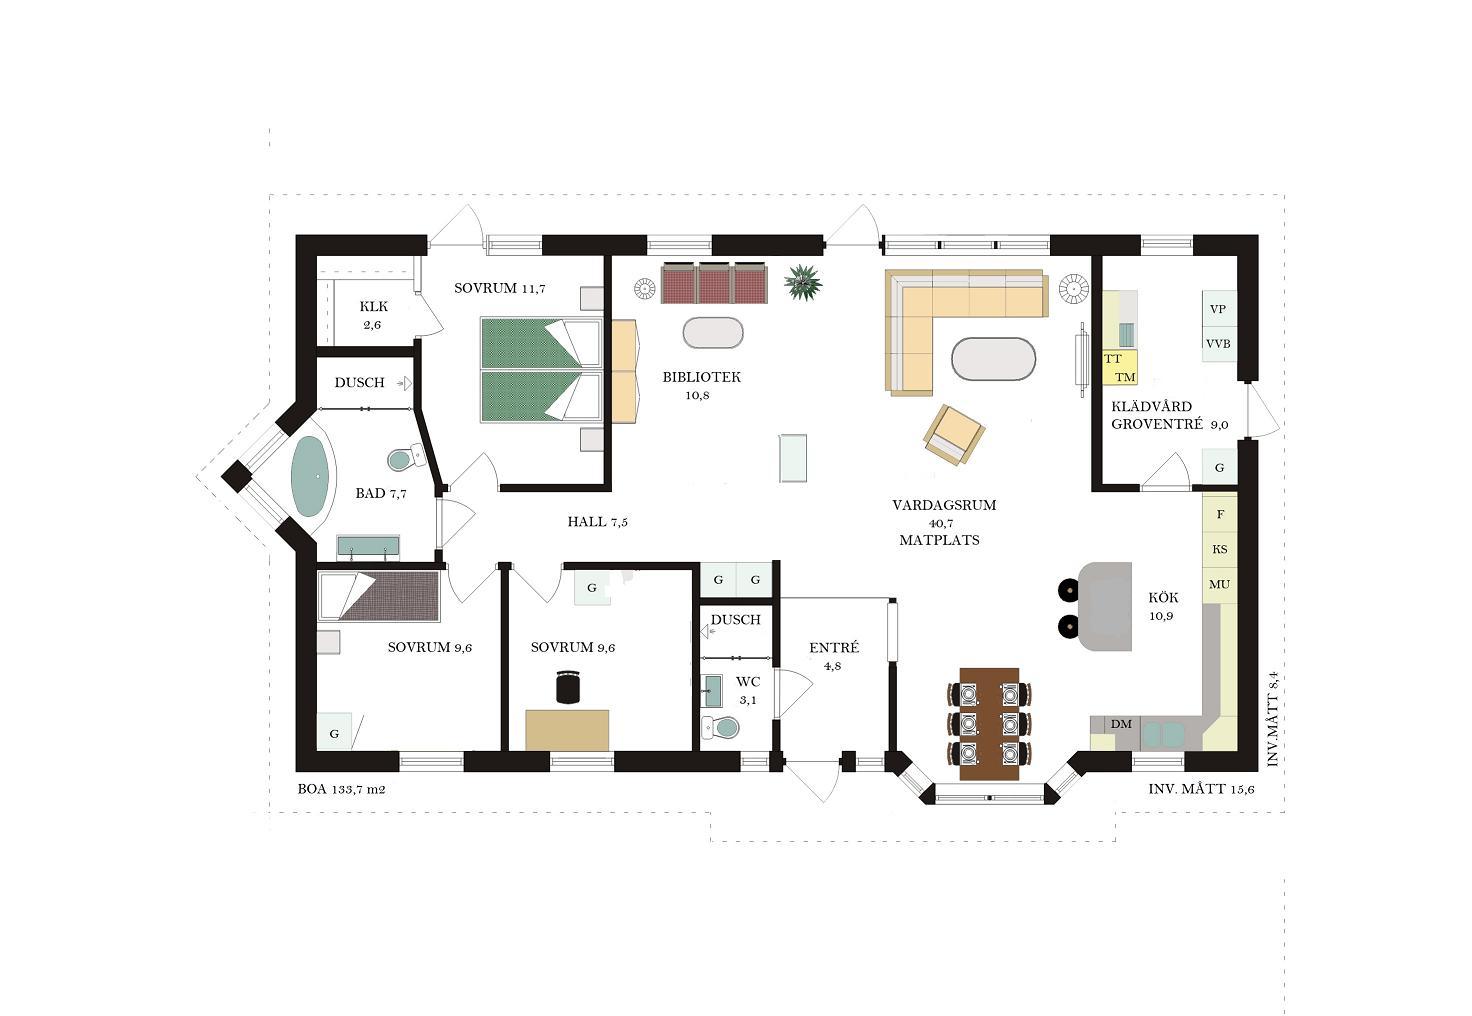 Villa Beierholm Planlosning